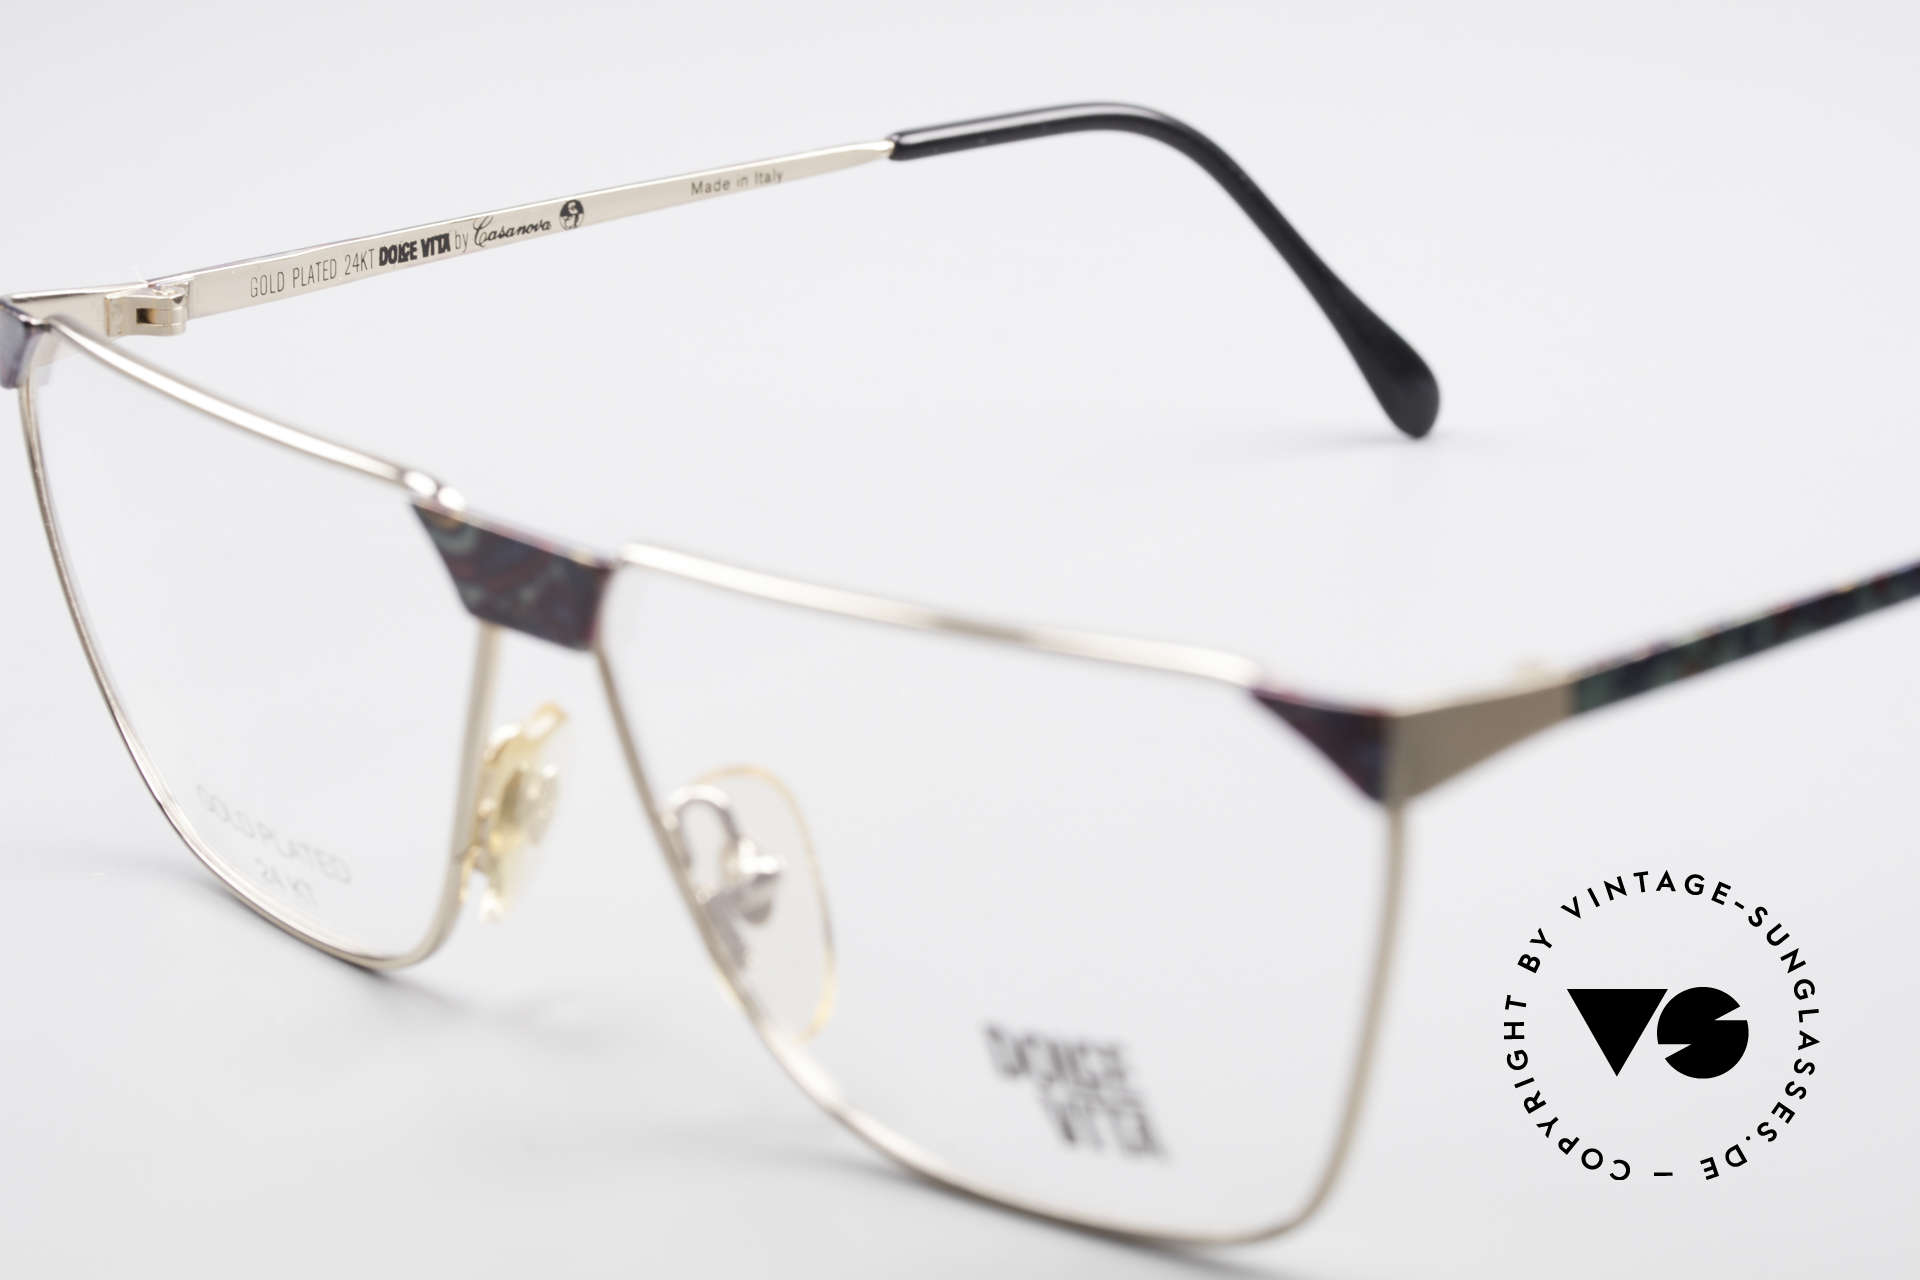 Casanova NM22 Dolce Vita 24kt Eyeglasses, NOS - unworn (like all our vintage Casanova frames), Made for Men and Women